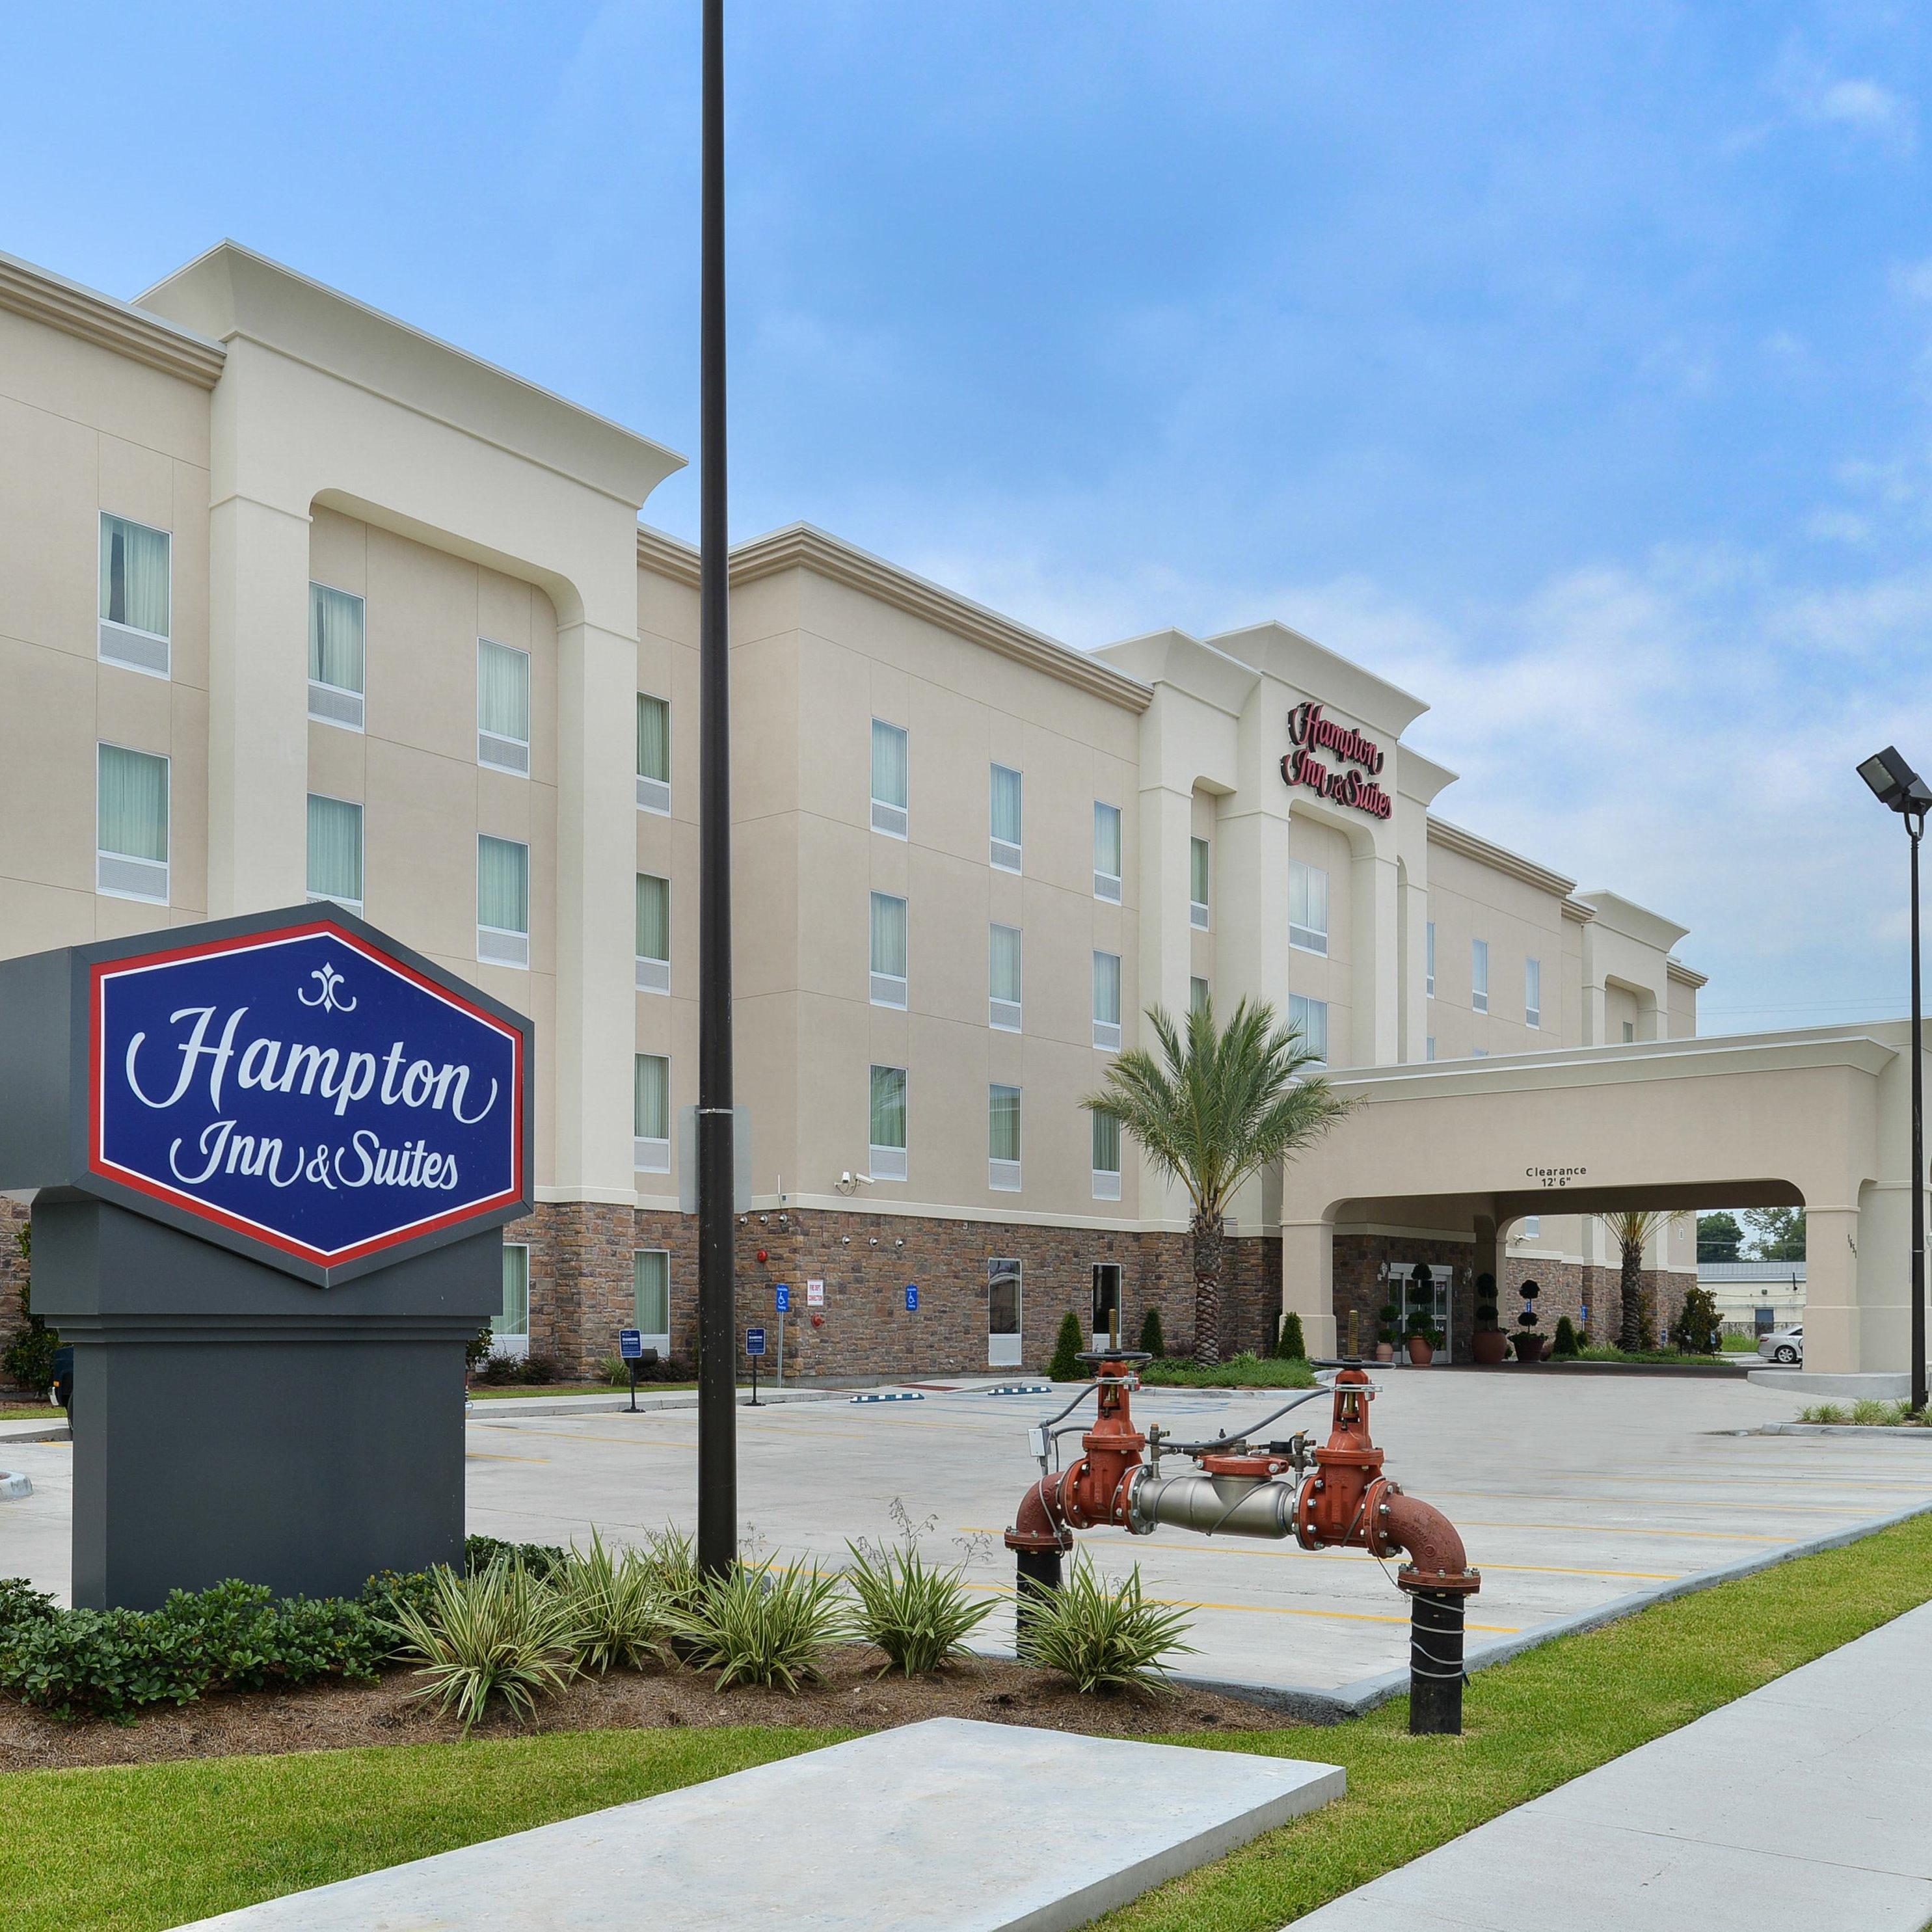 Hampton Inn & Suites Harvey/New Orleans West Bank